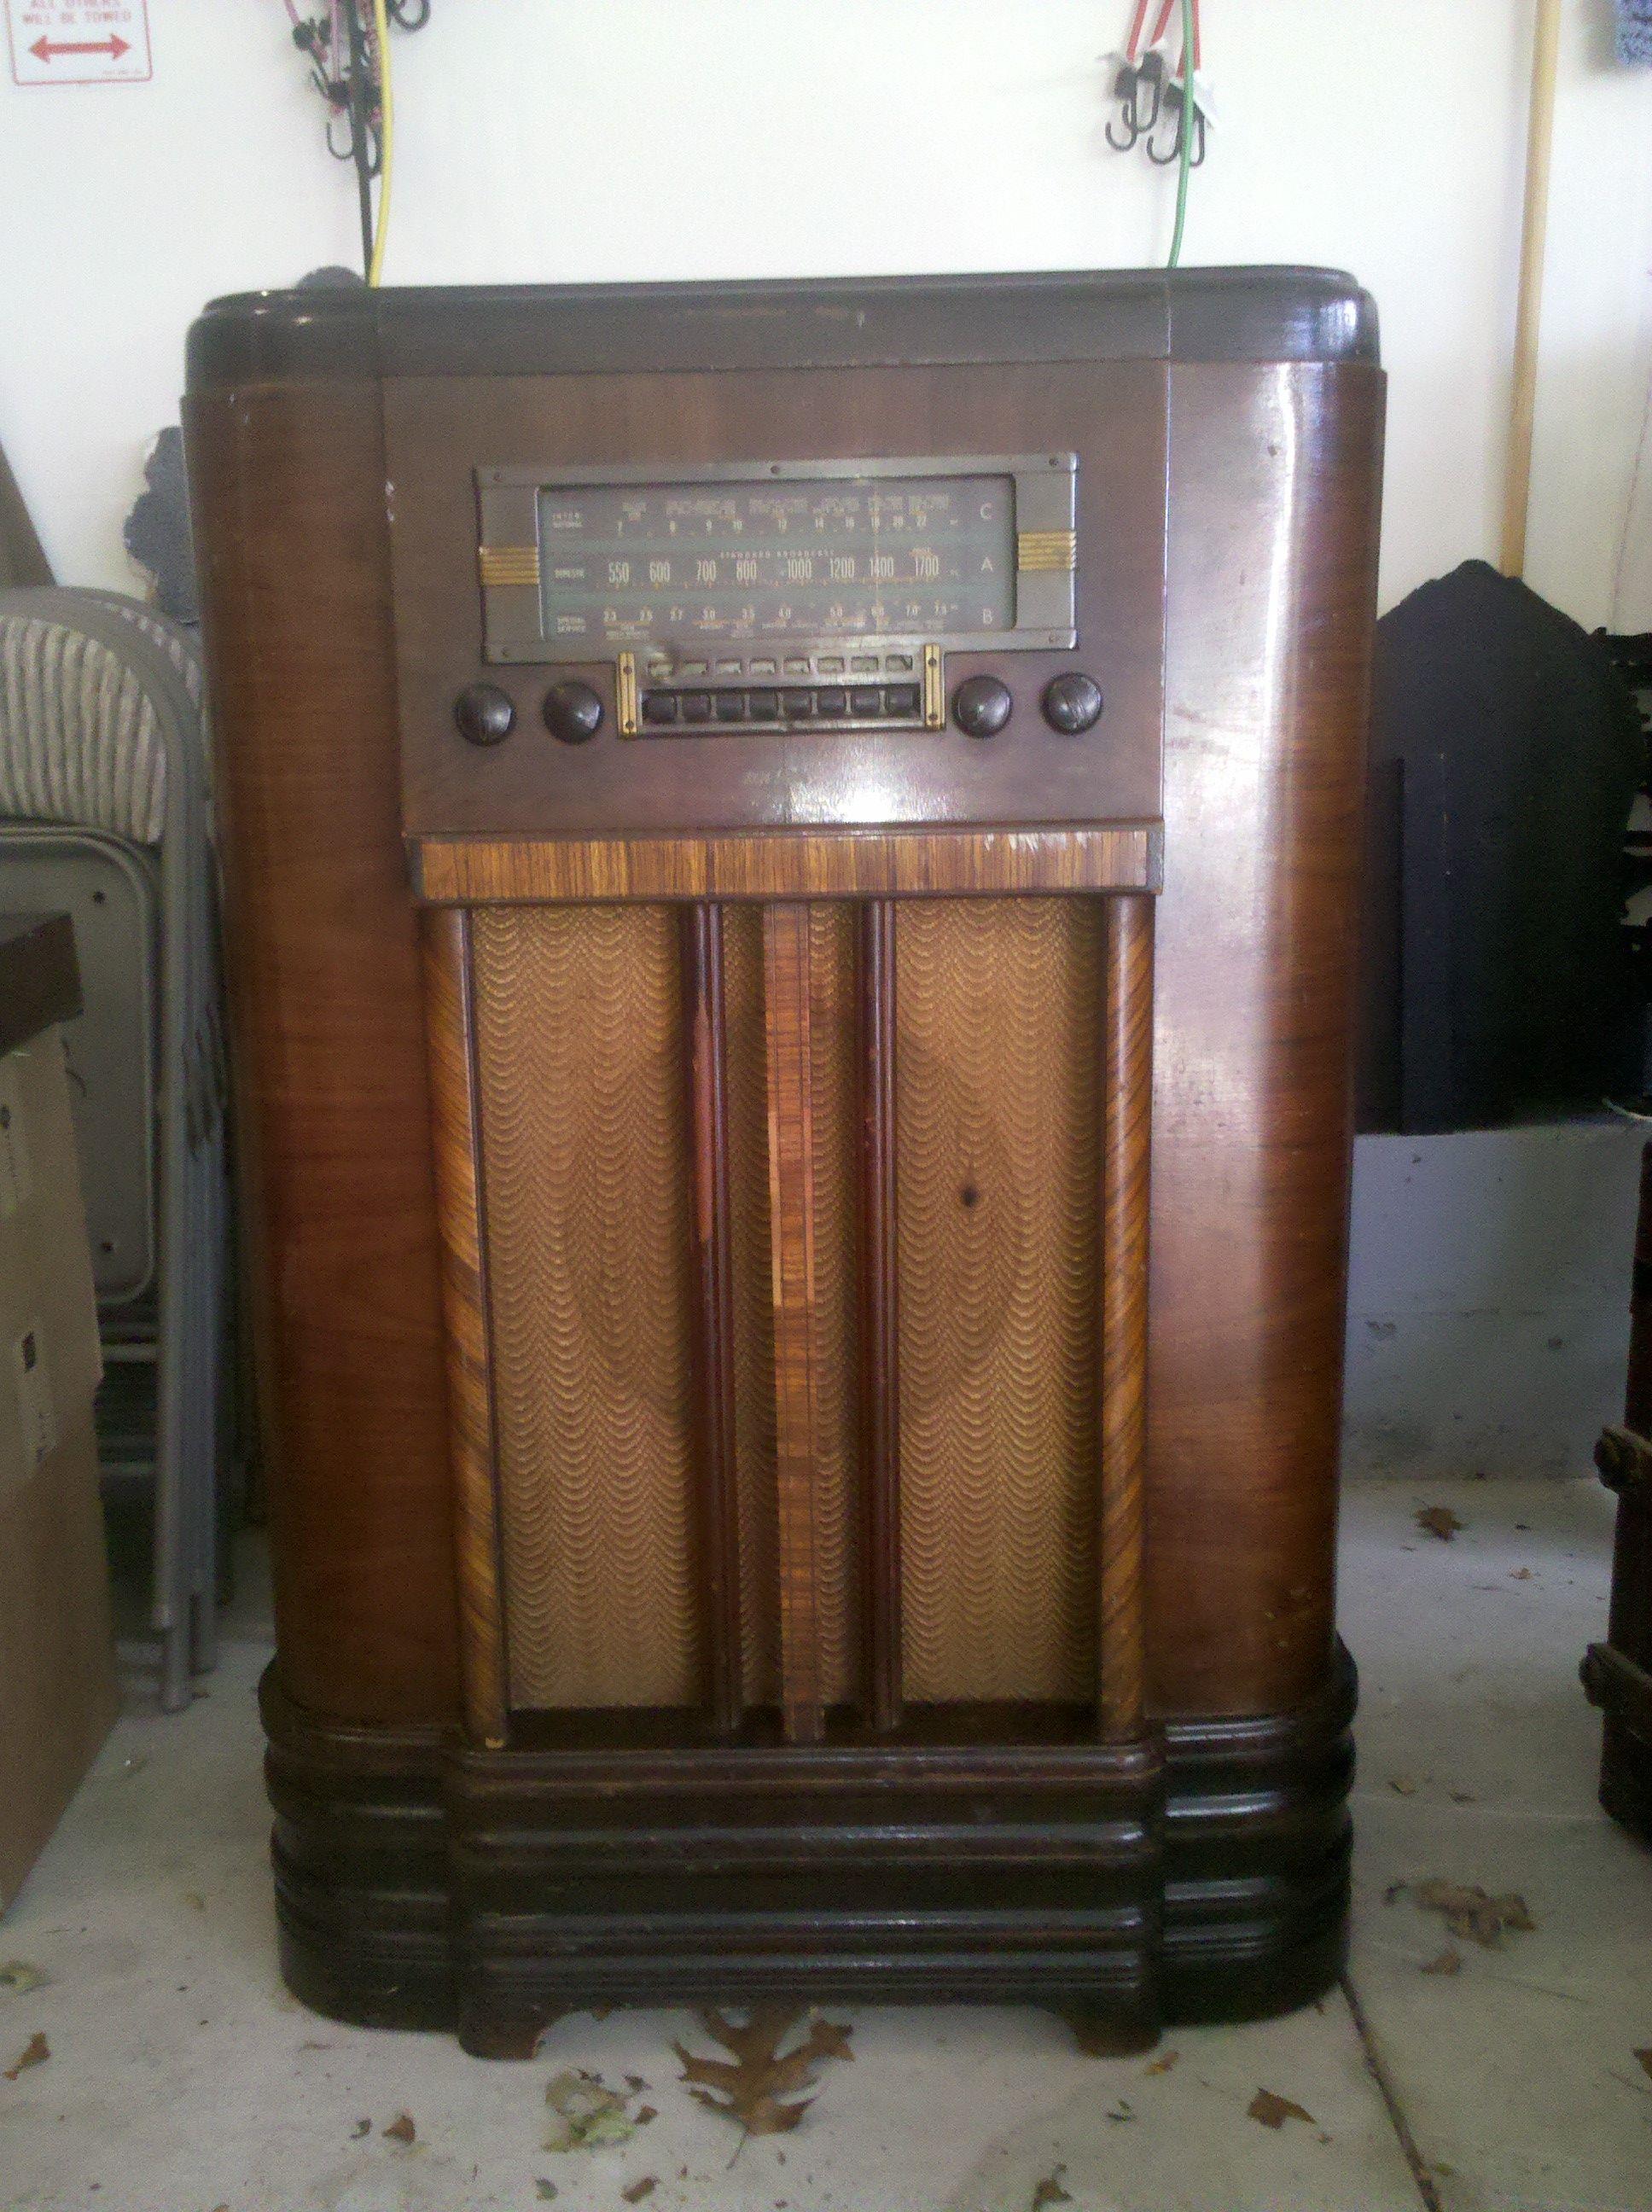 Pin By Odemar Ferreira On Radio Art Et Deco Antique Radio Vintage Radio Old Radios